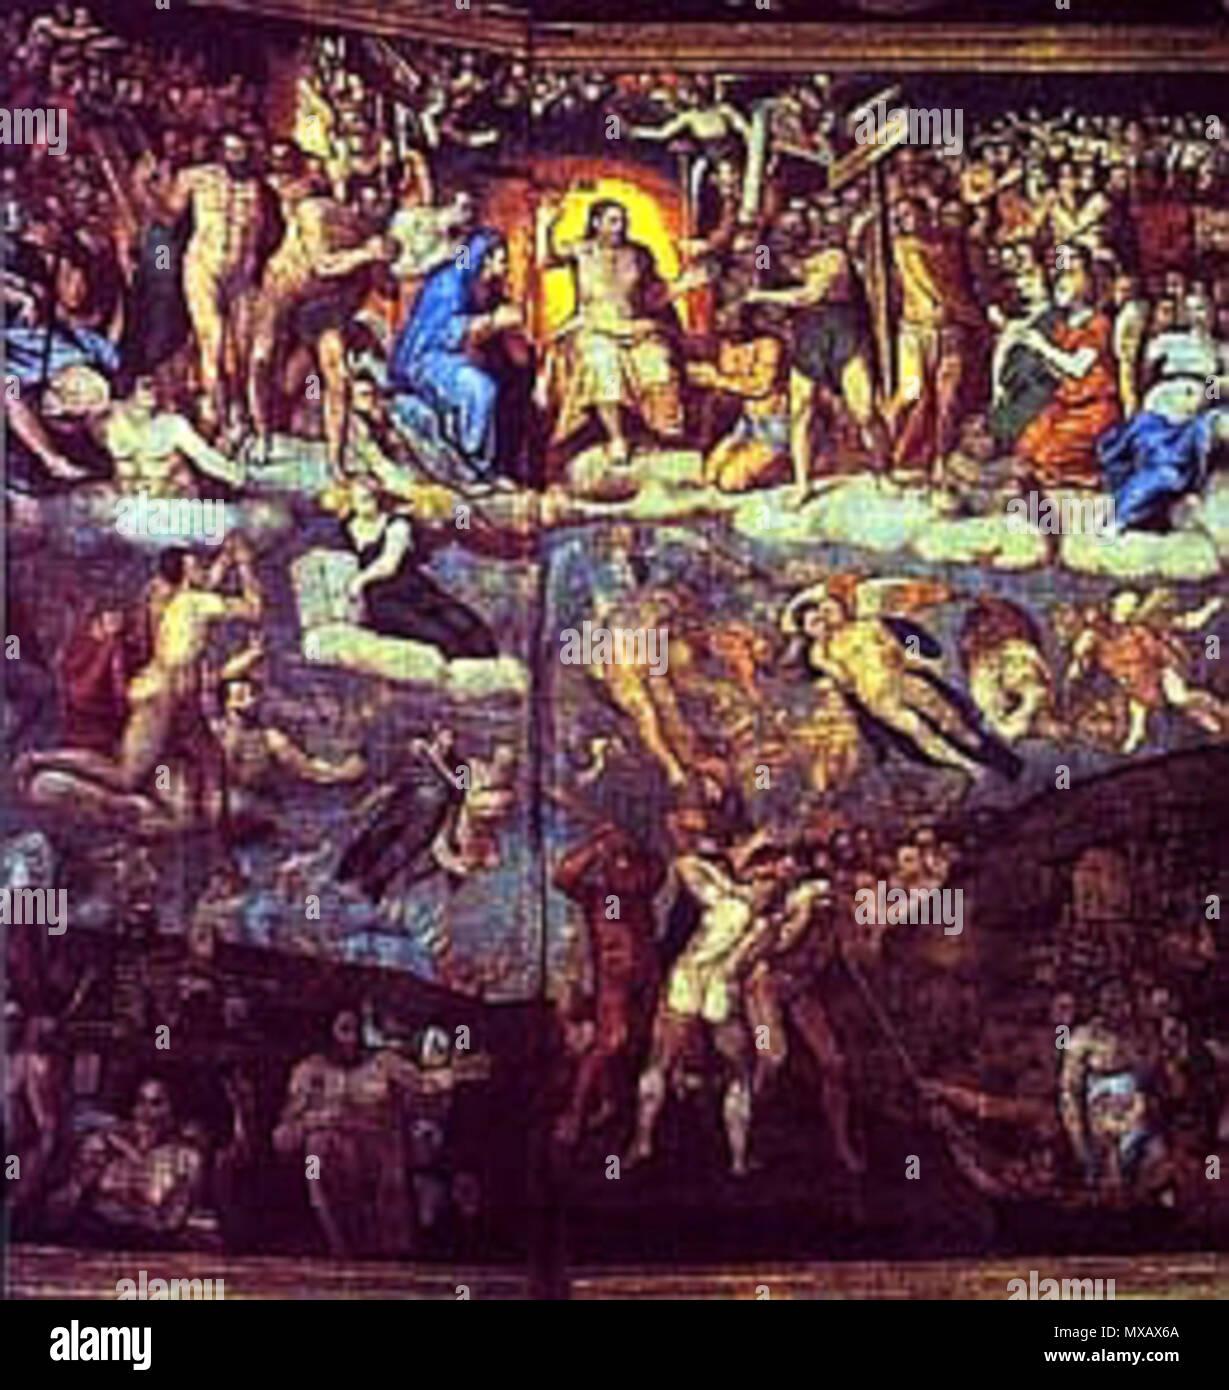 ba36d23a4f Juicio Final de la iglesia de Ibdes . hacia 1565